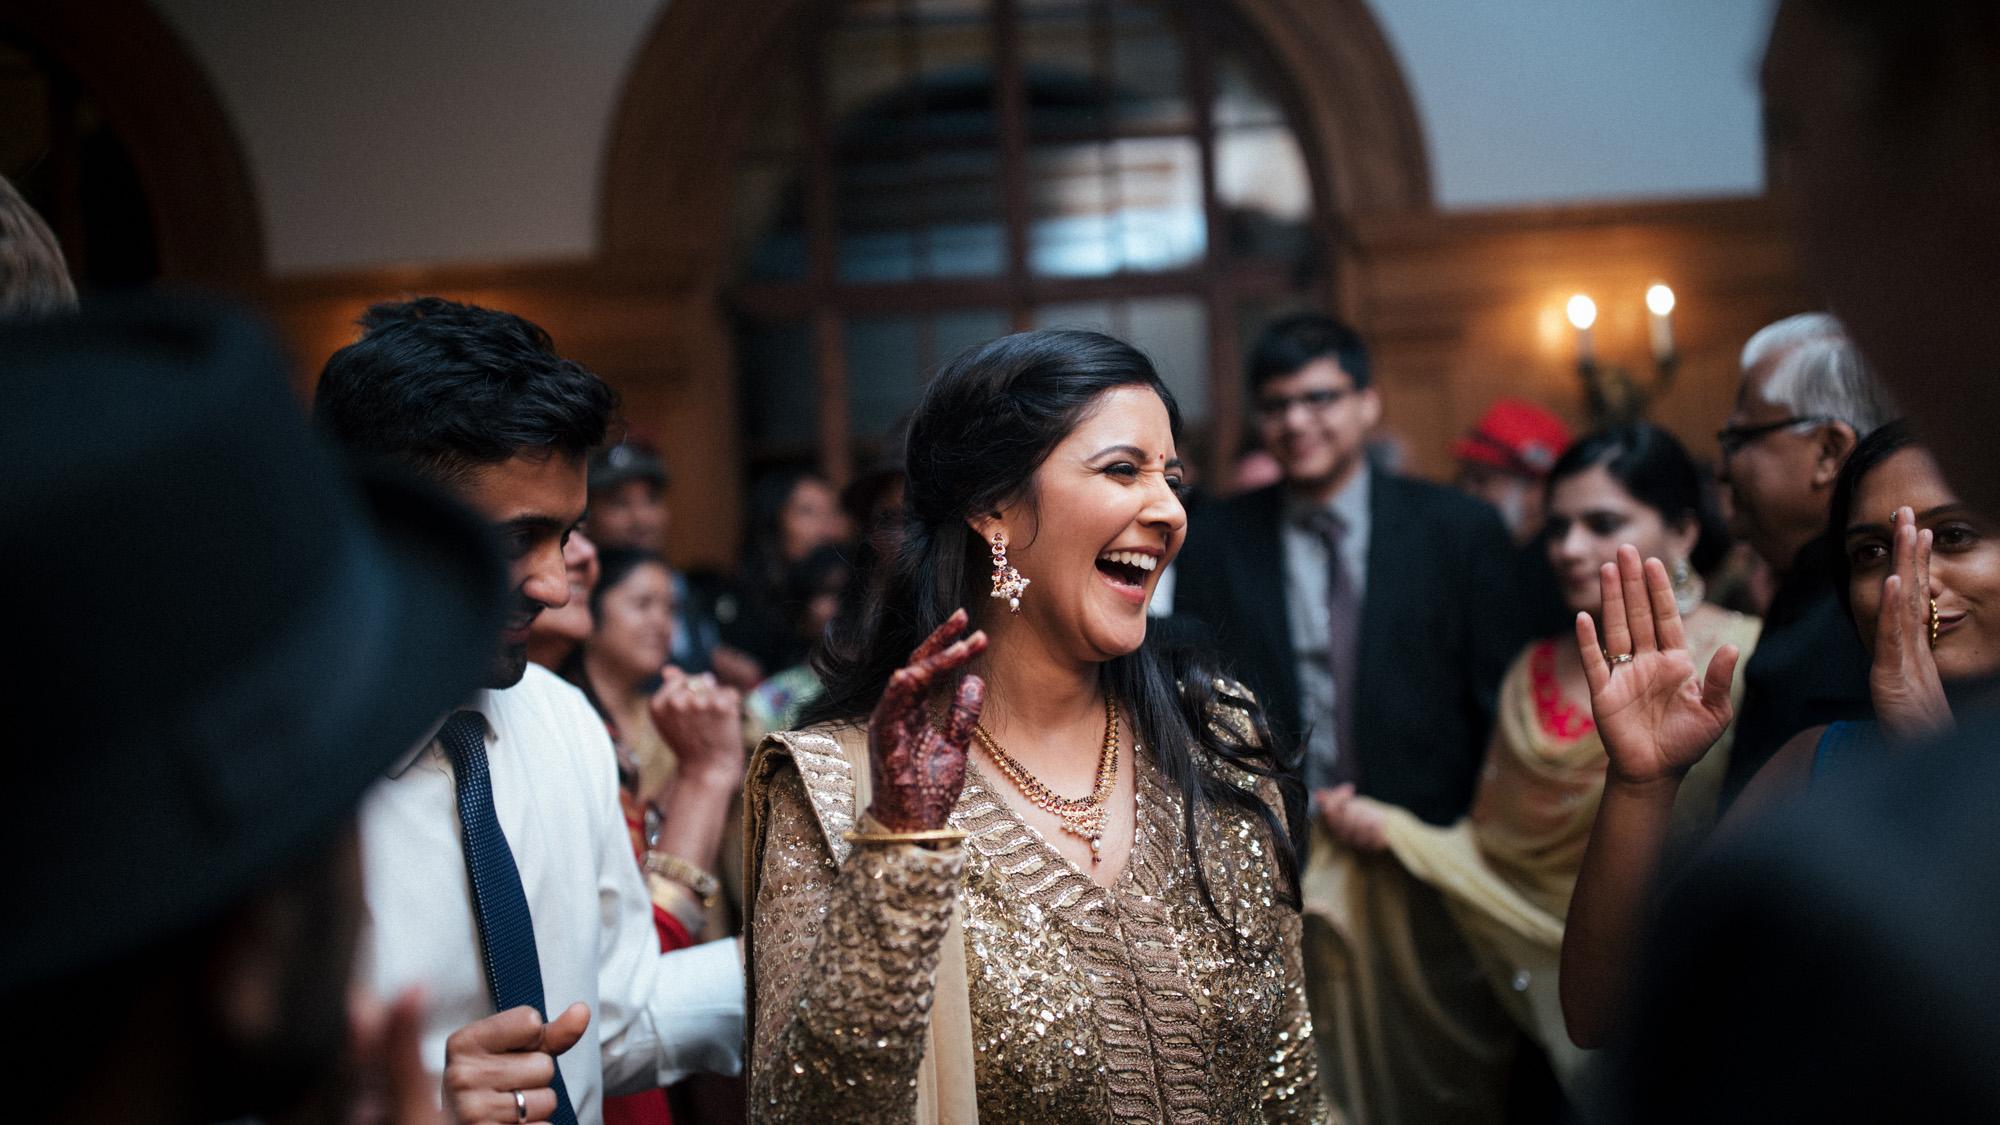 anu_maneesh_alec_vanderboom_Indian_wedding_photography-0172.jpg